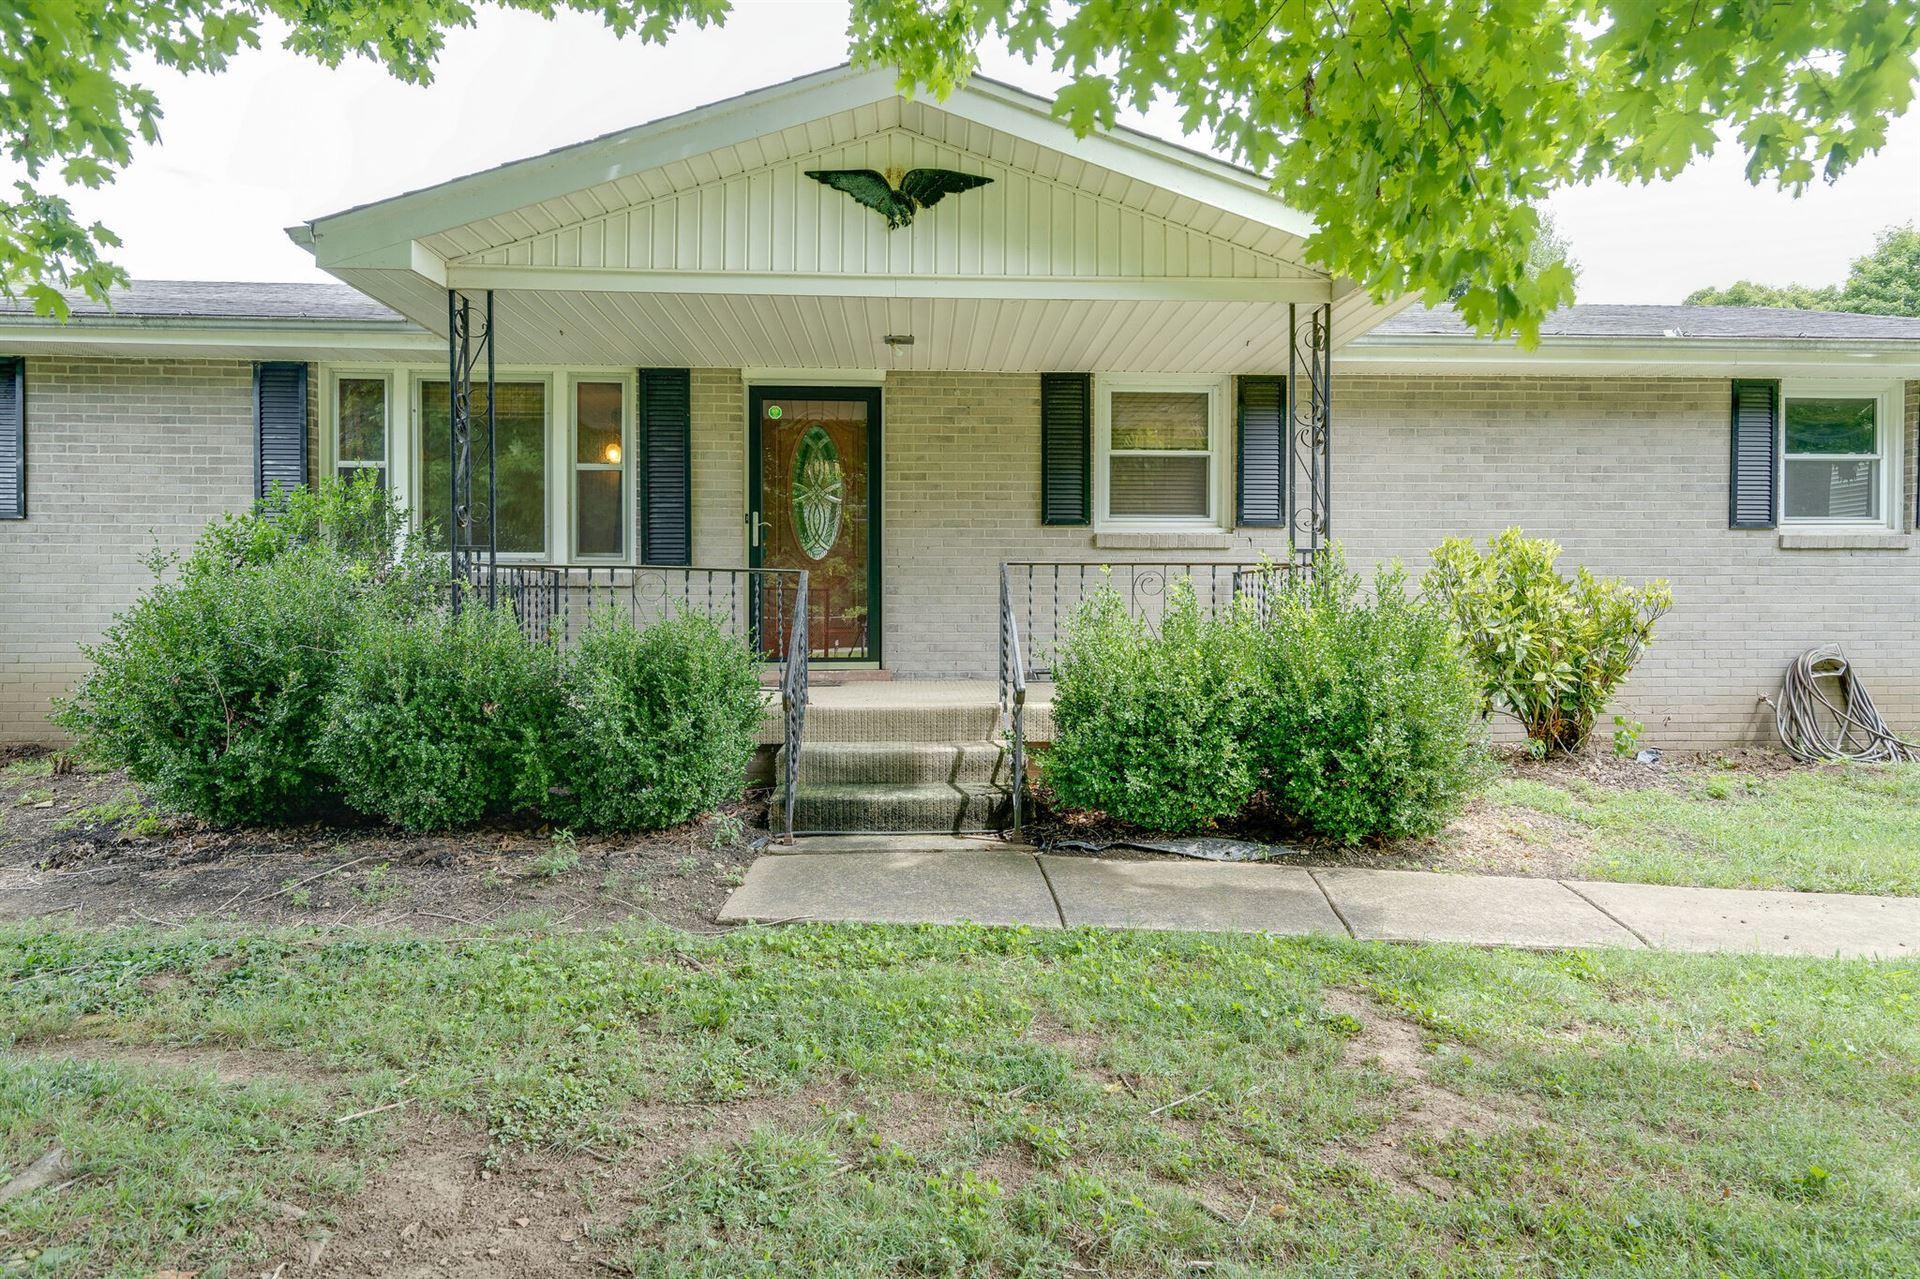 3040 Patton Branch Rd, Goodlettsville, TN 37072 - MLS#: 2282288